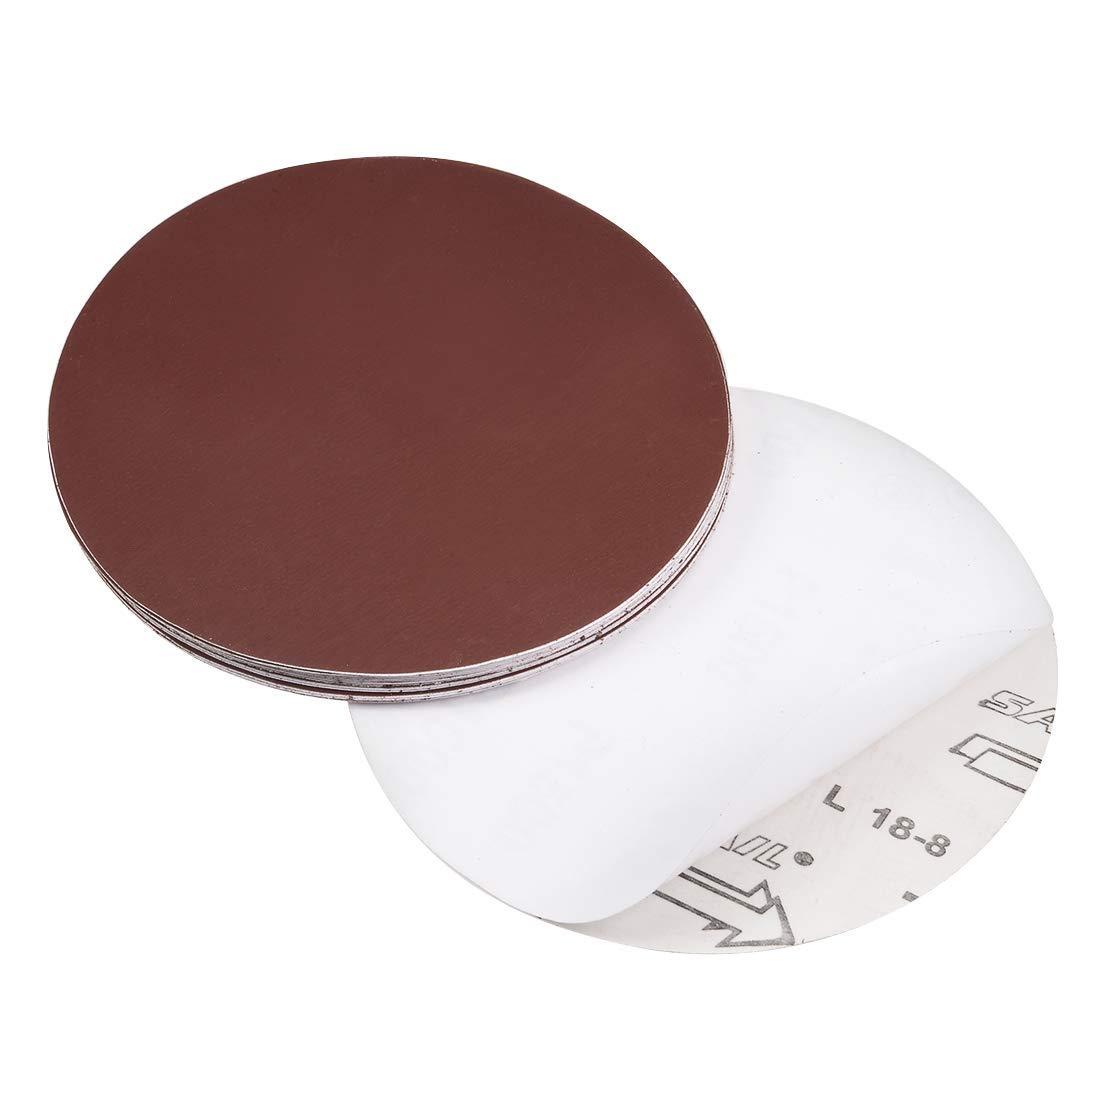 6-inch 1500-Grits PSA Sanding Disc Adhesive-Backed for Orbital Sander 20pcs